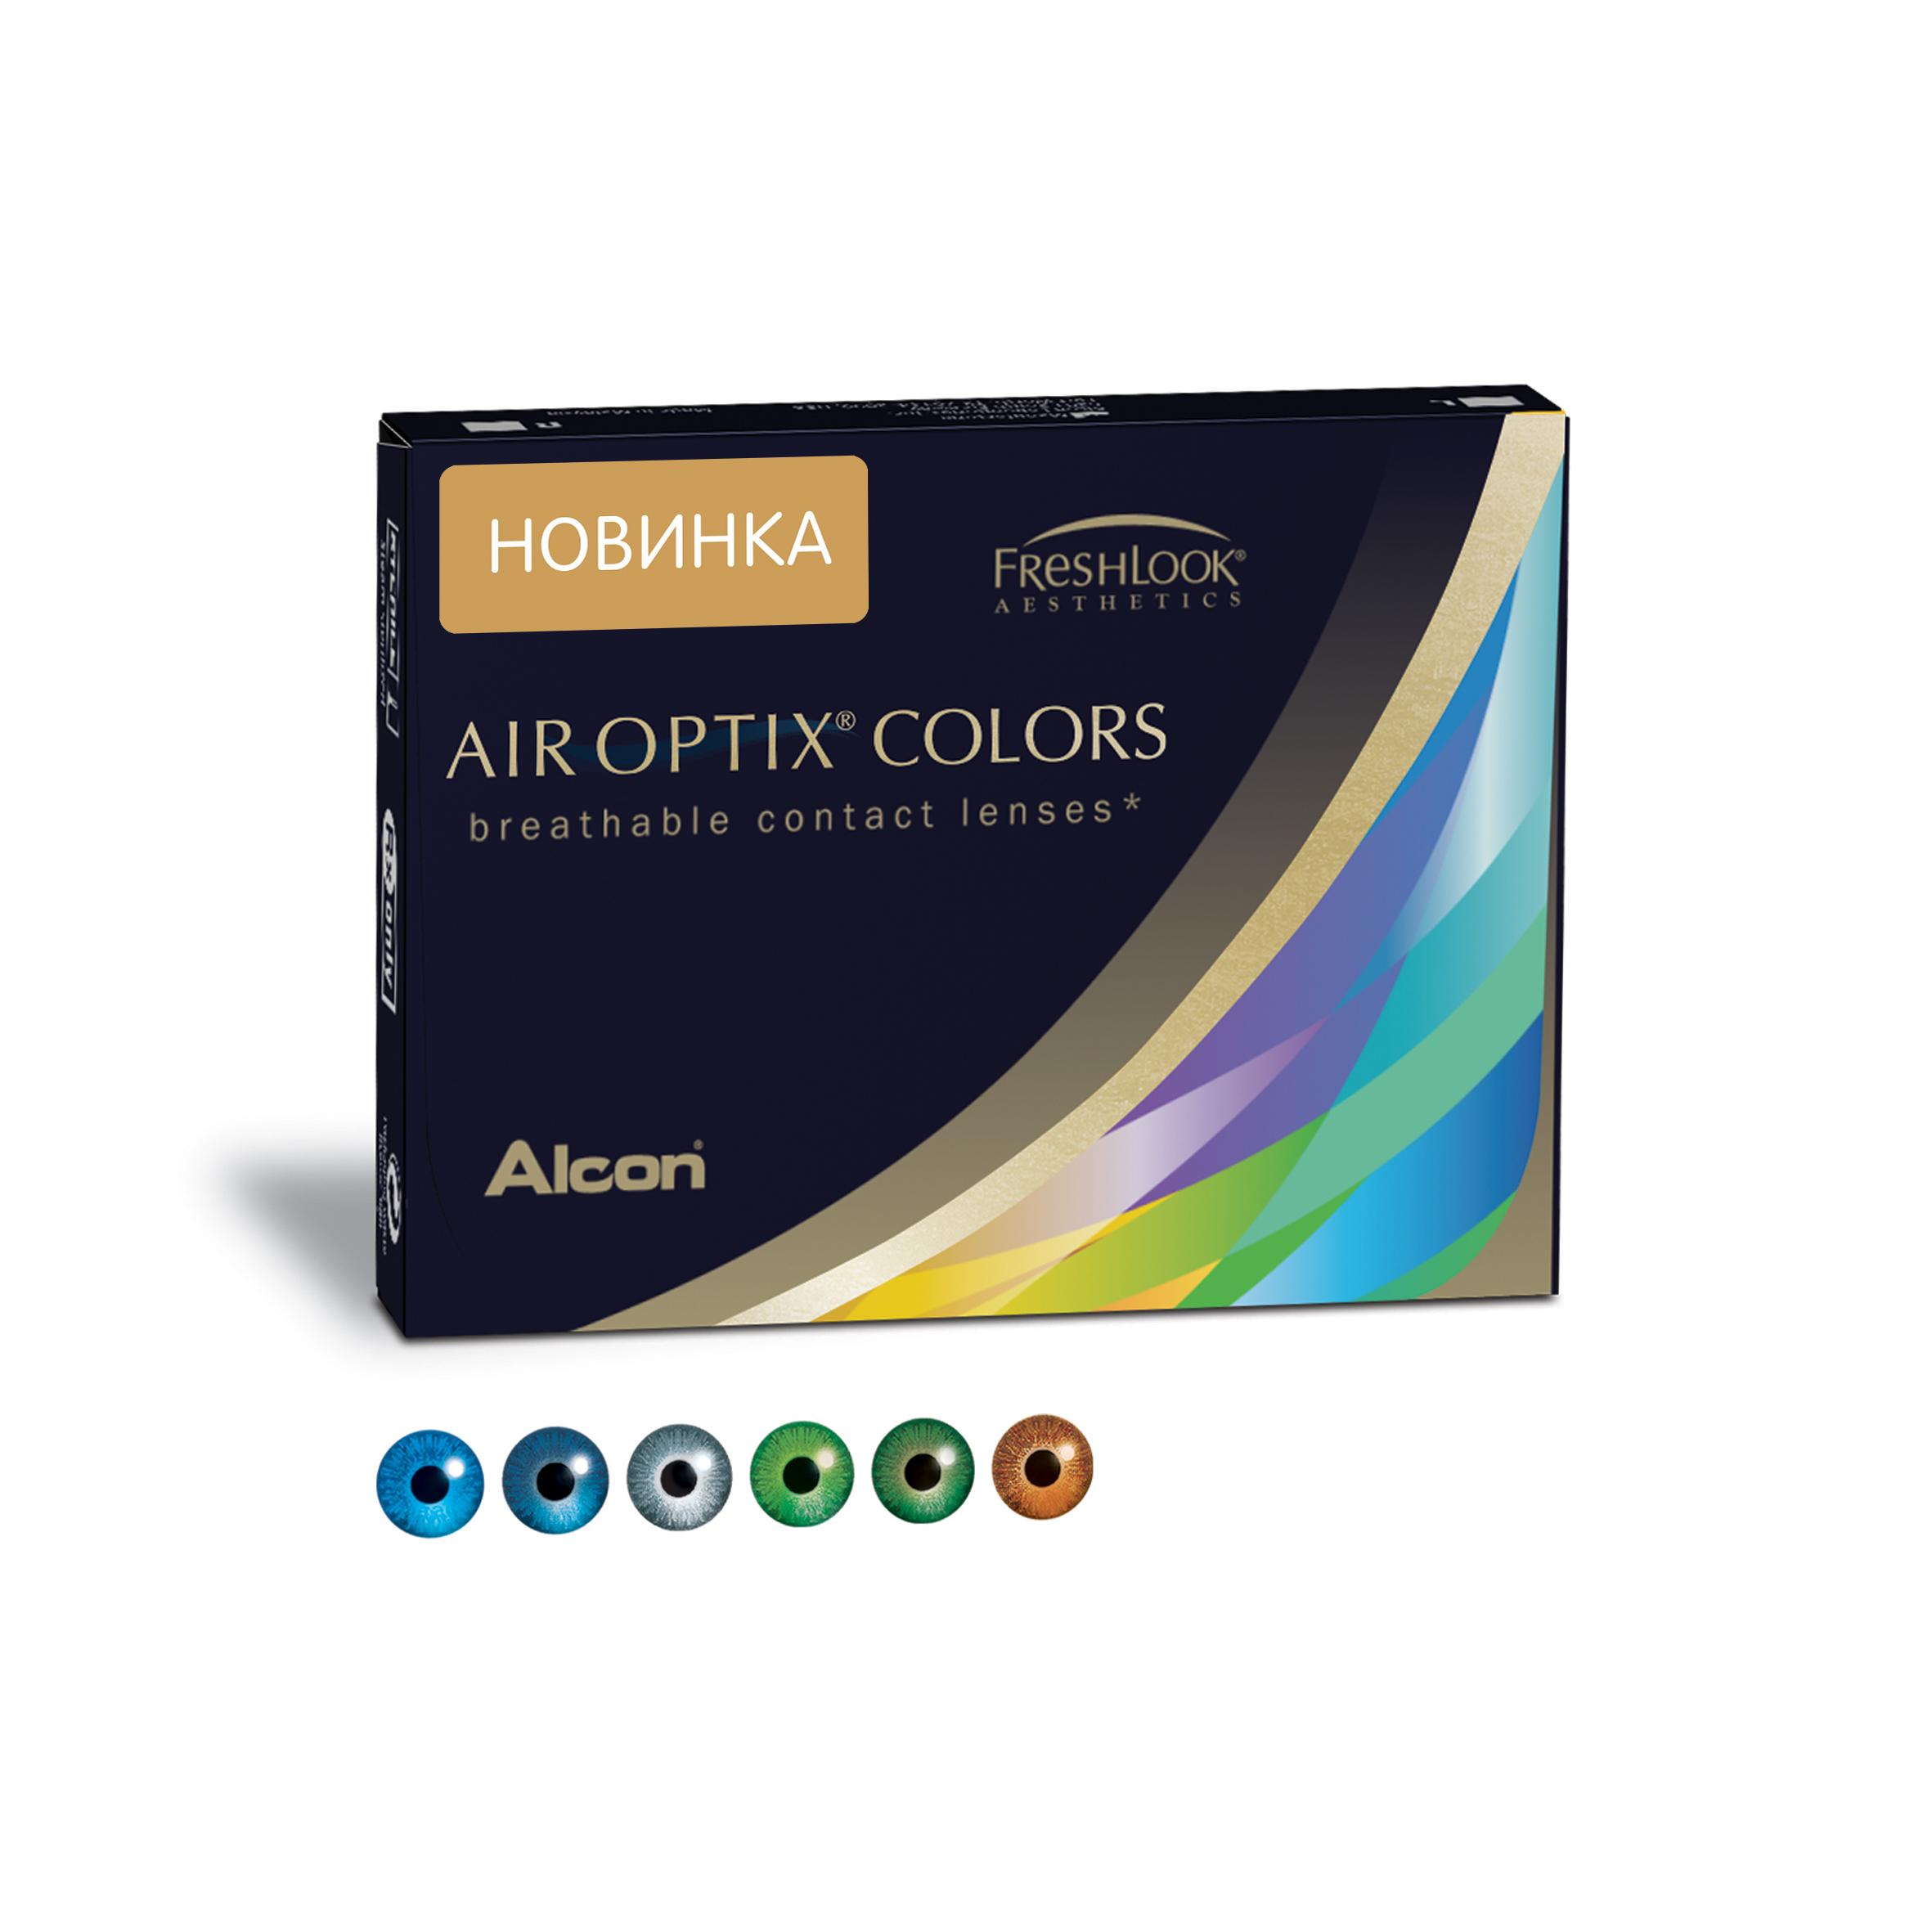 Аlcon контактные линзы Air Optix Colors 2 шт -4.00 Sterling Gray31746237Мягкие контактные линзы